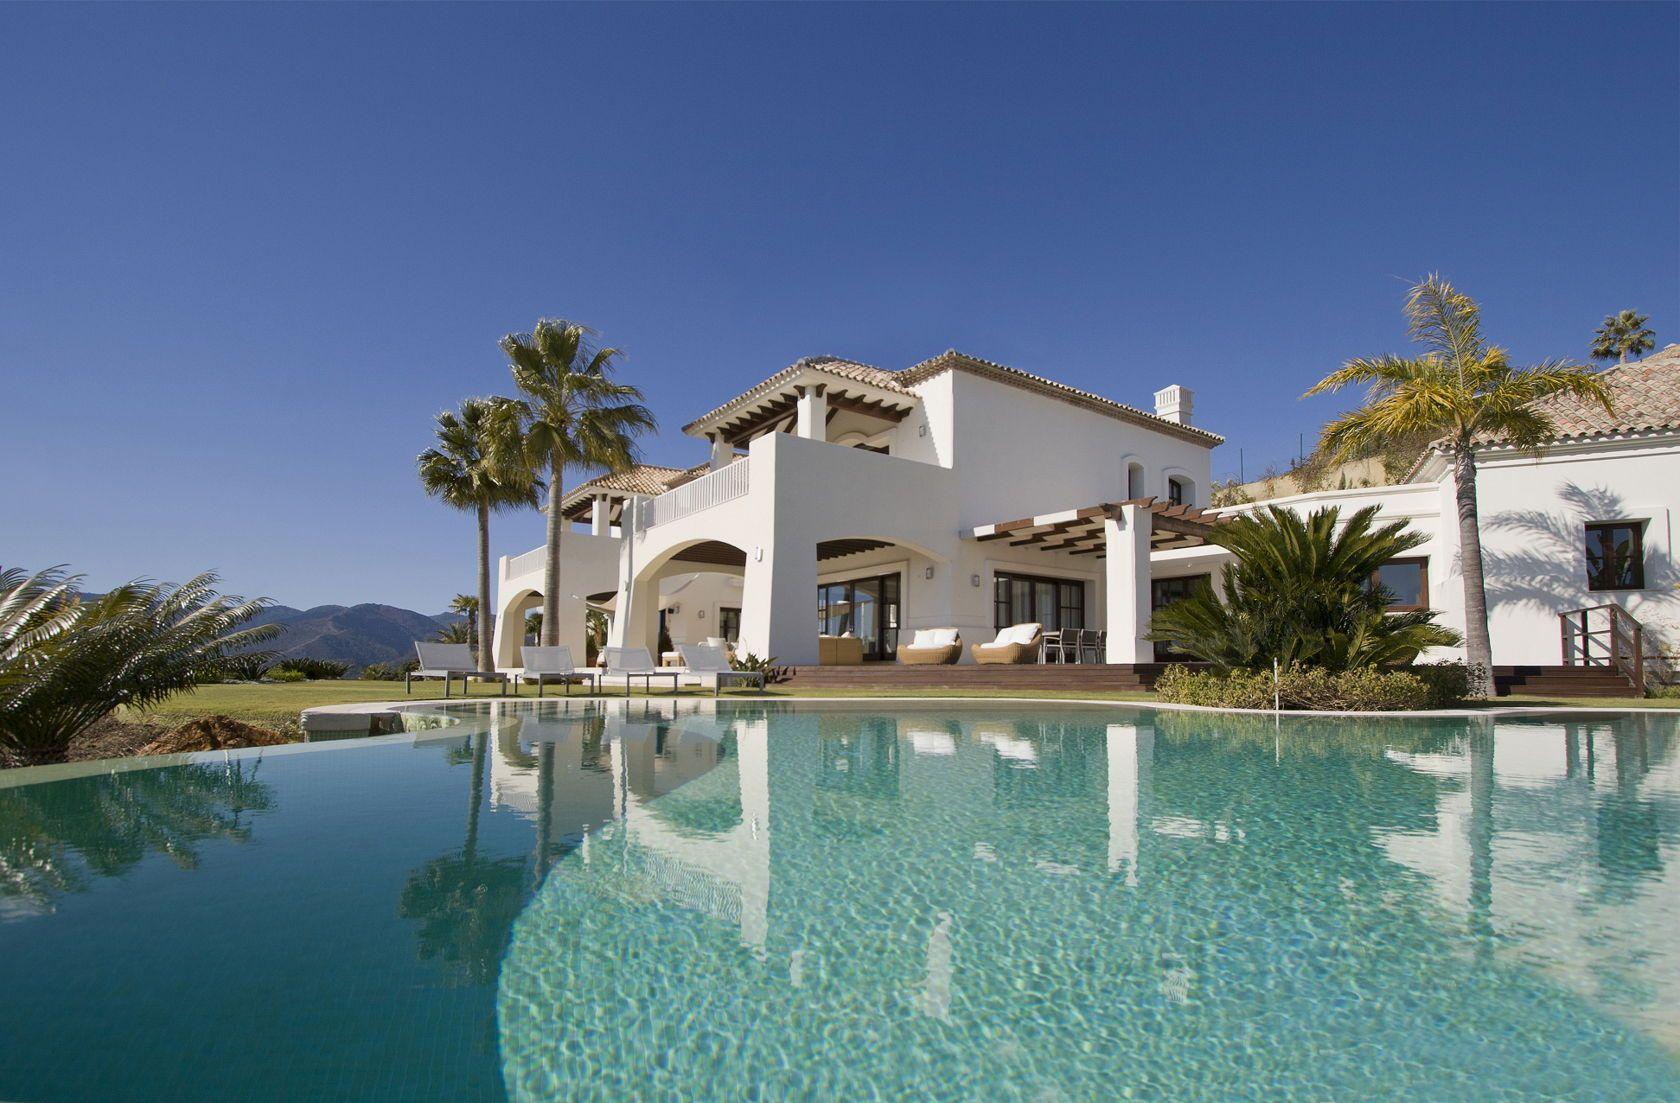 Дом на юге испании продажа недвижимости в доминикане